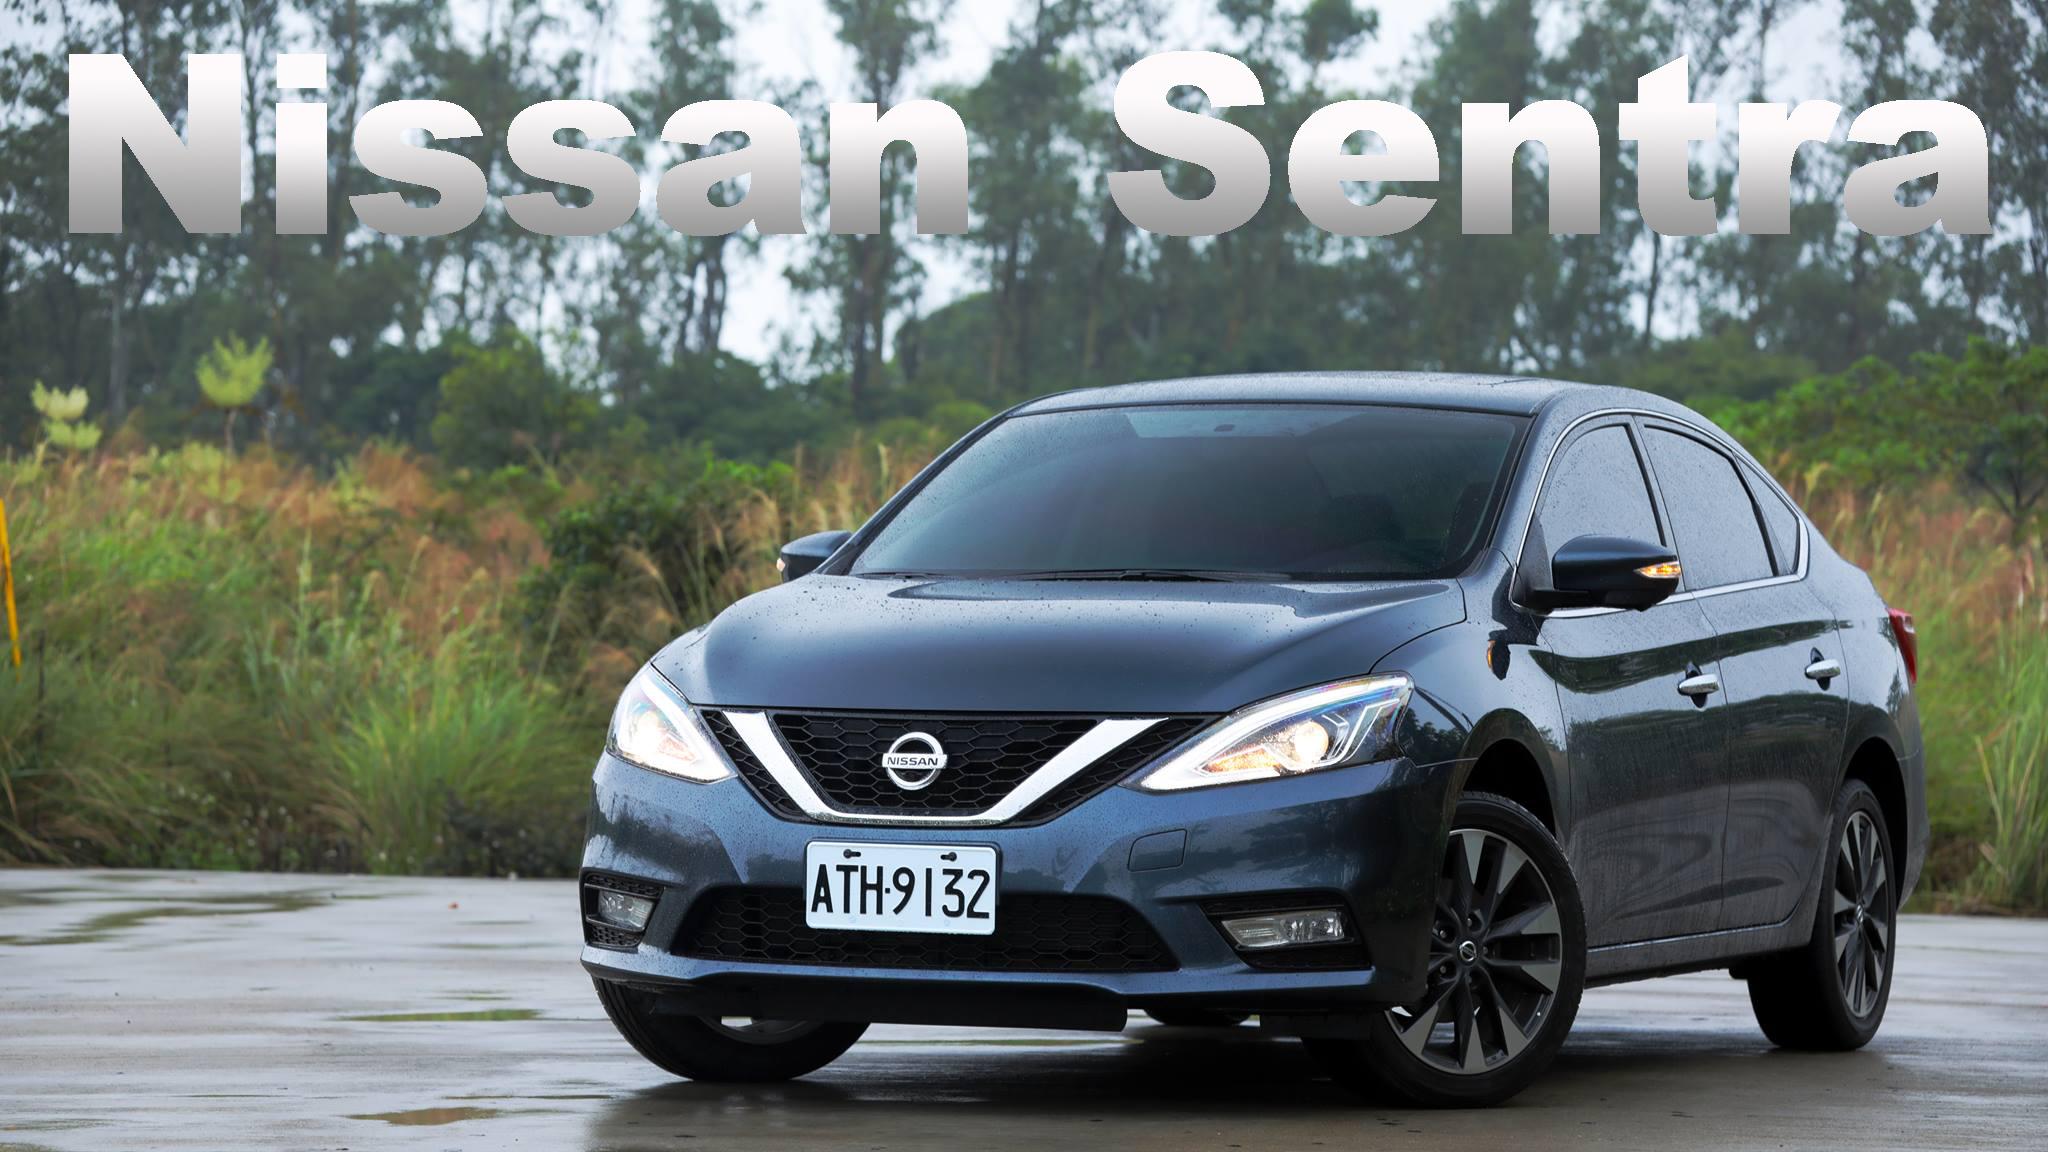 舒適優等生進化論 Nissan New Sentra